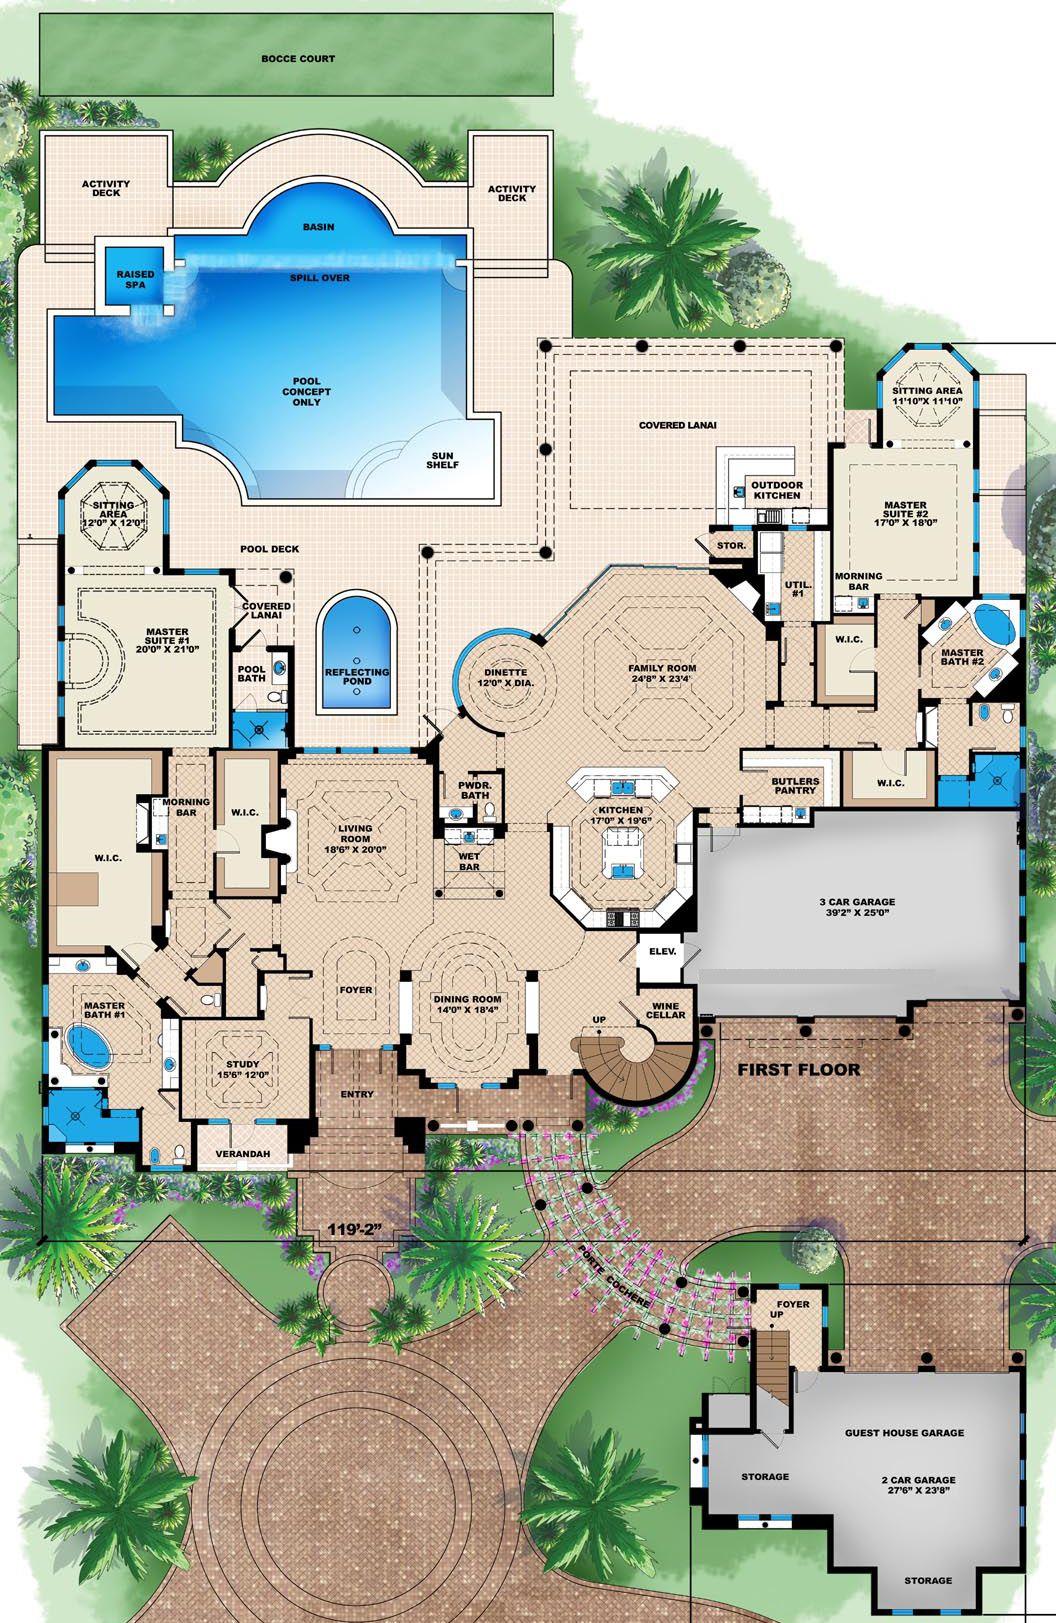 House Plan 1018 00271 Mediterranean Plan 10 662 Square Feet 6 Bedrooms 8 5 Bathrooms Mediterranean House Plans Beach House Plans House Layout Plans